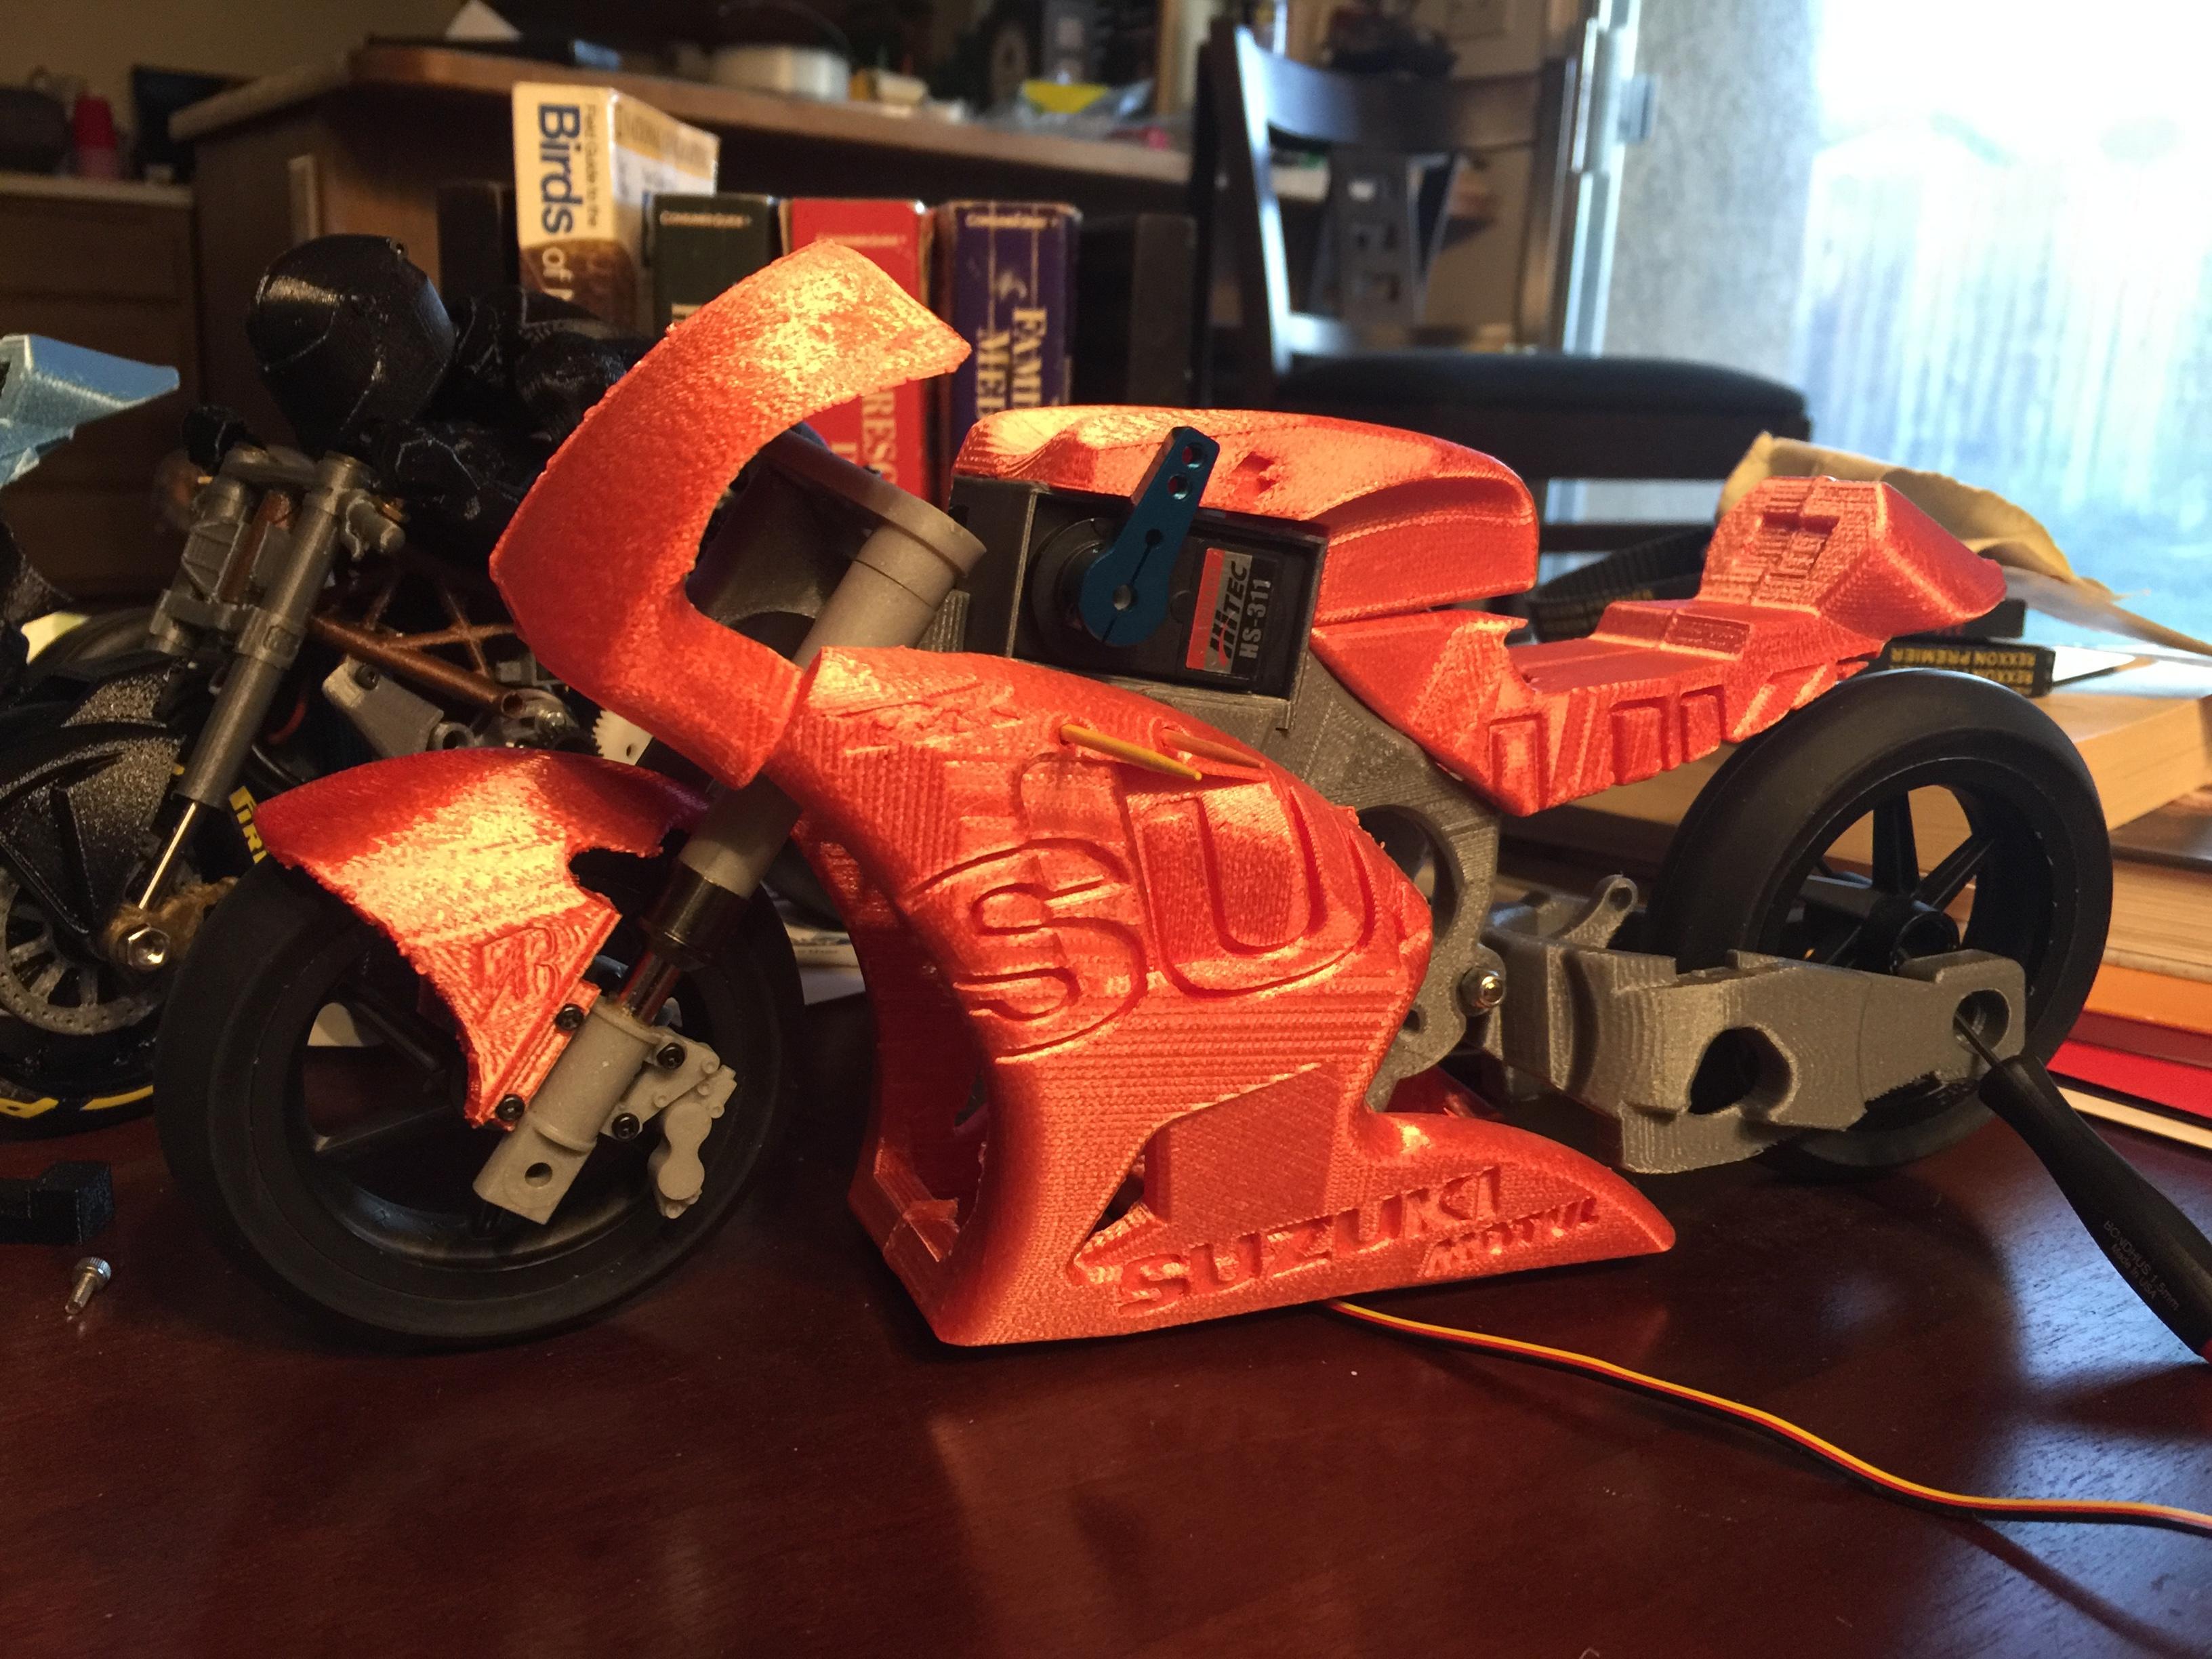 3d Printed RC Motorcycles: 2016 Ducati Draxter and 2016 Suzuki GSX-RR MotoGP